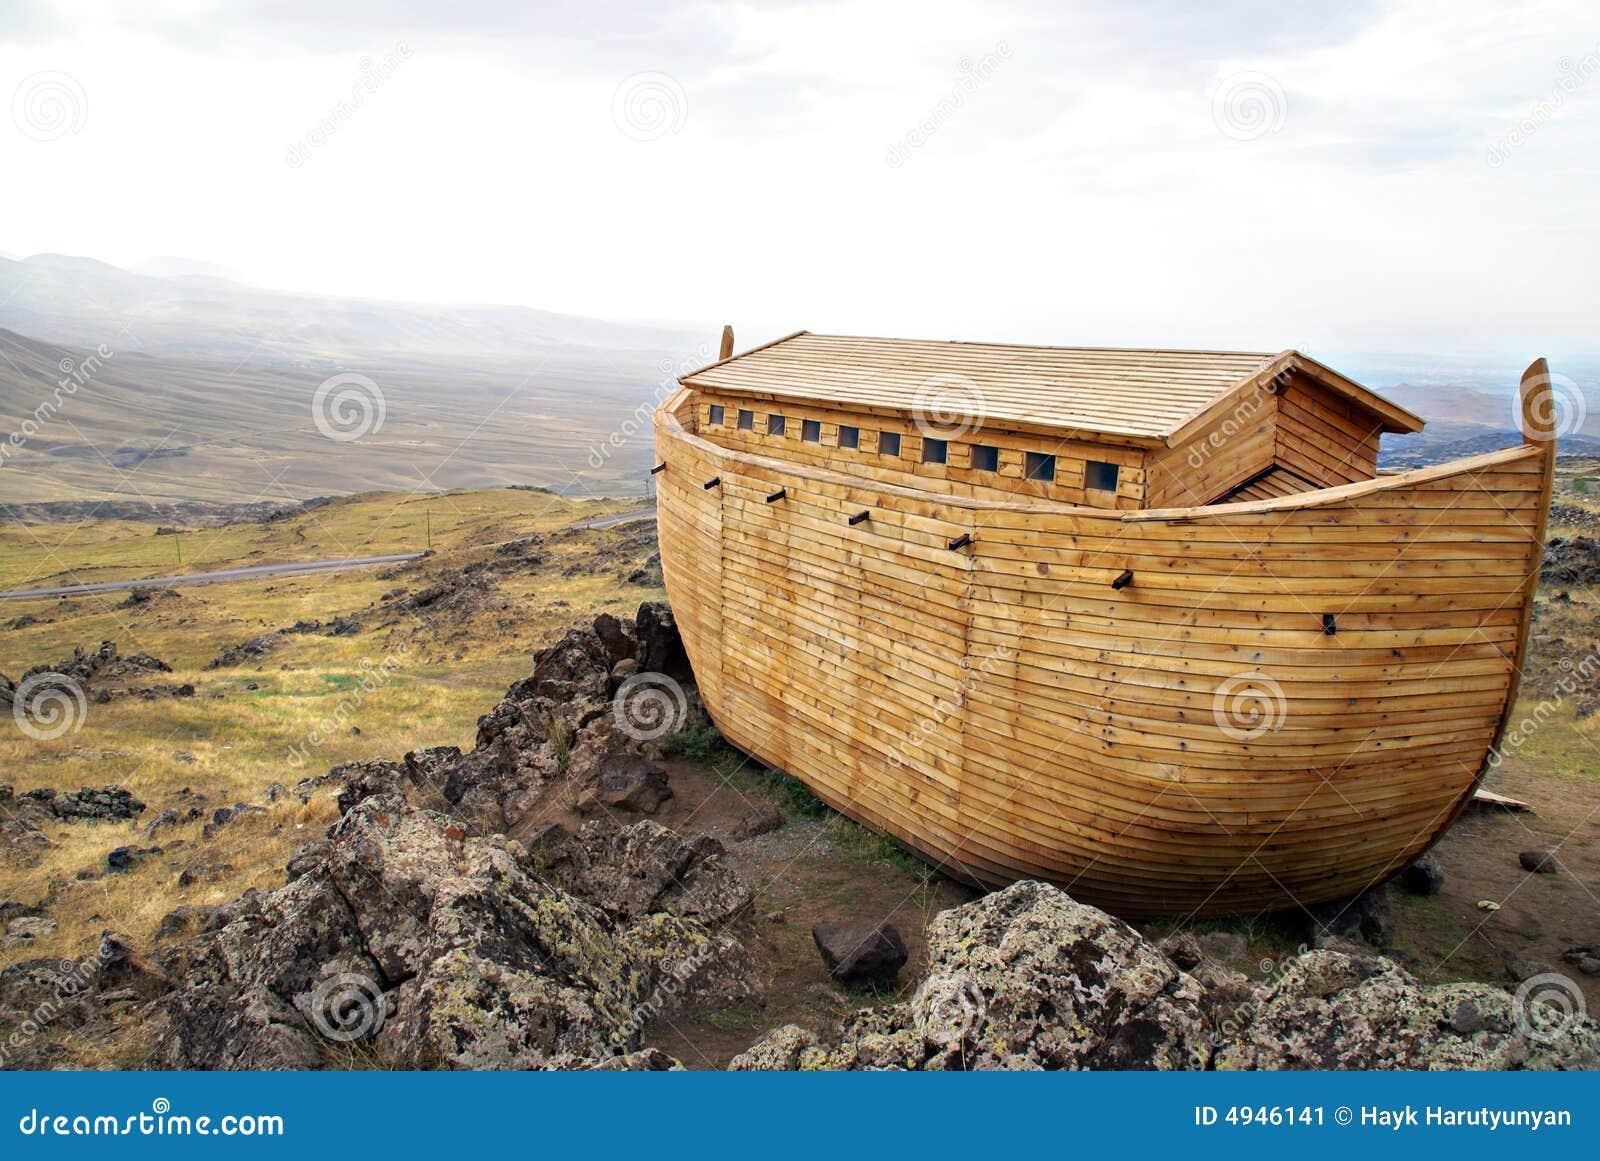 Arca de Noah